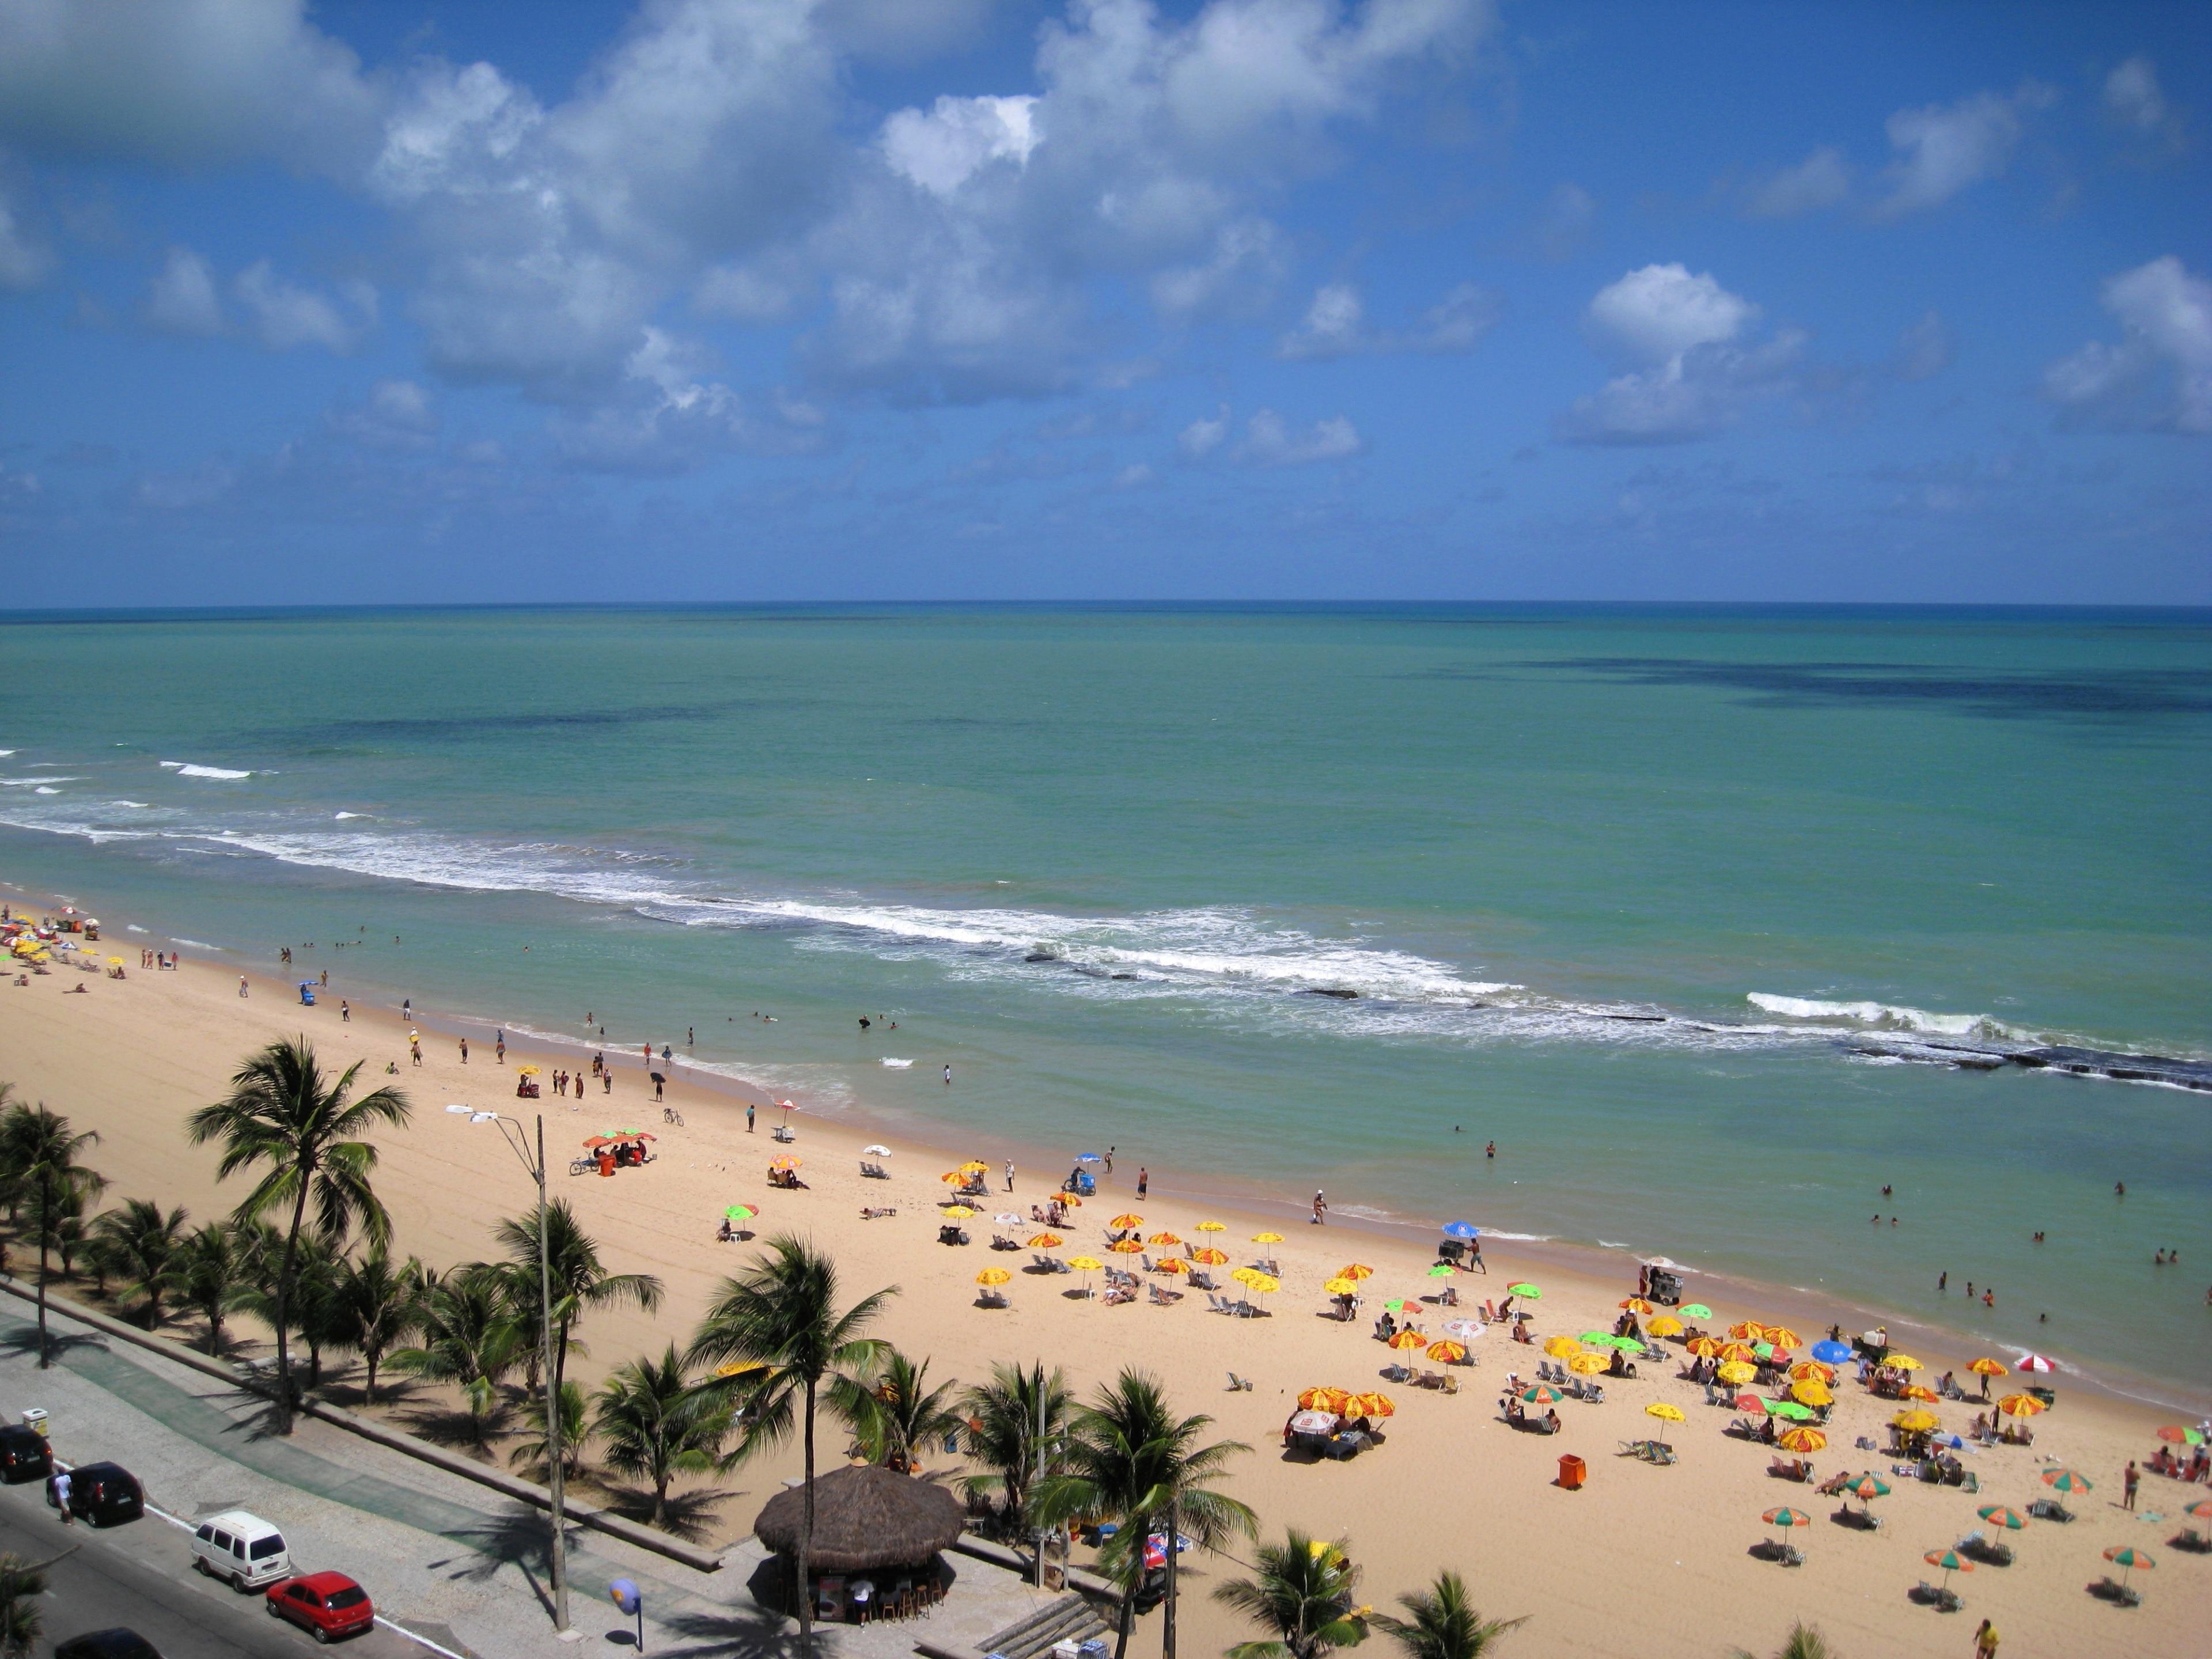 Boa Viagem Beach, Recife, Pernambuco State, Brazil